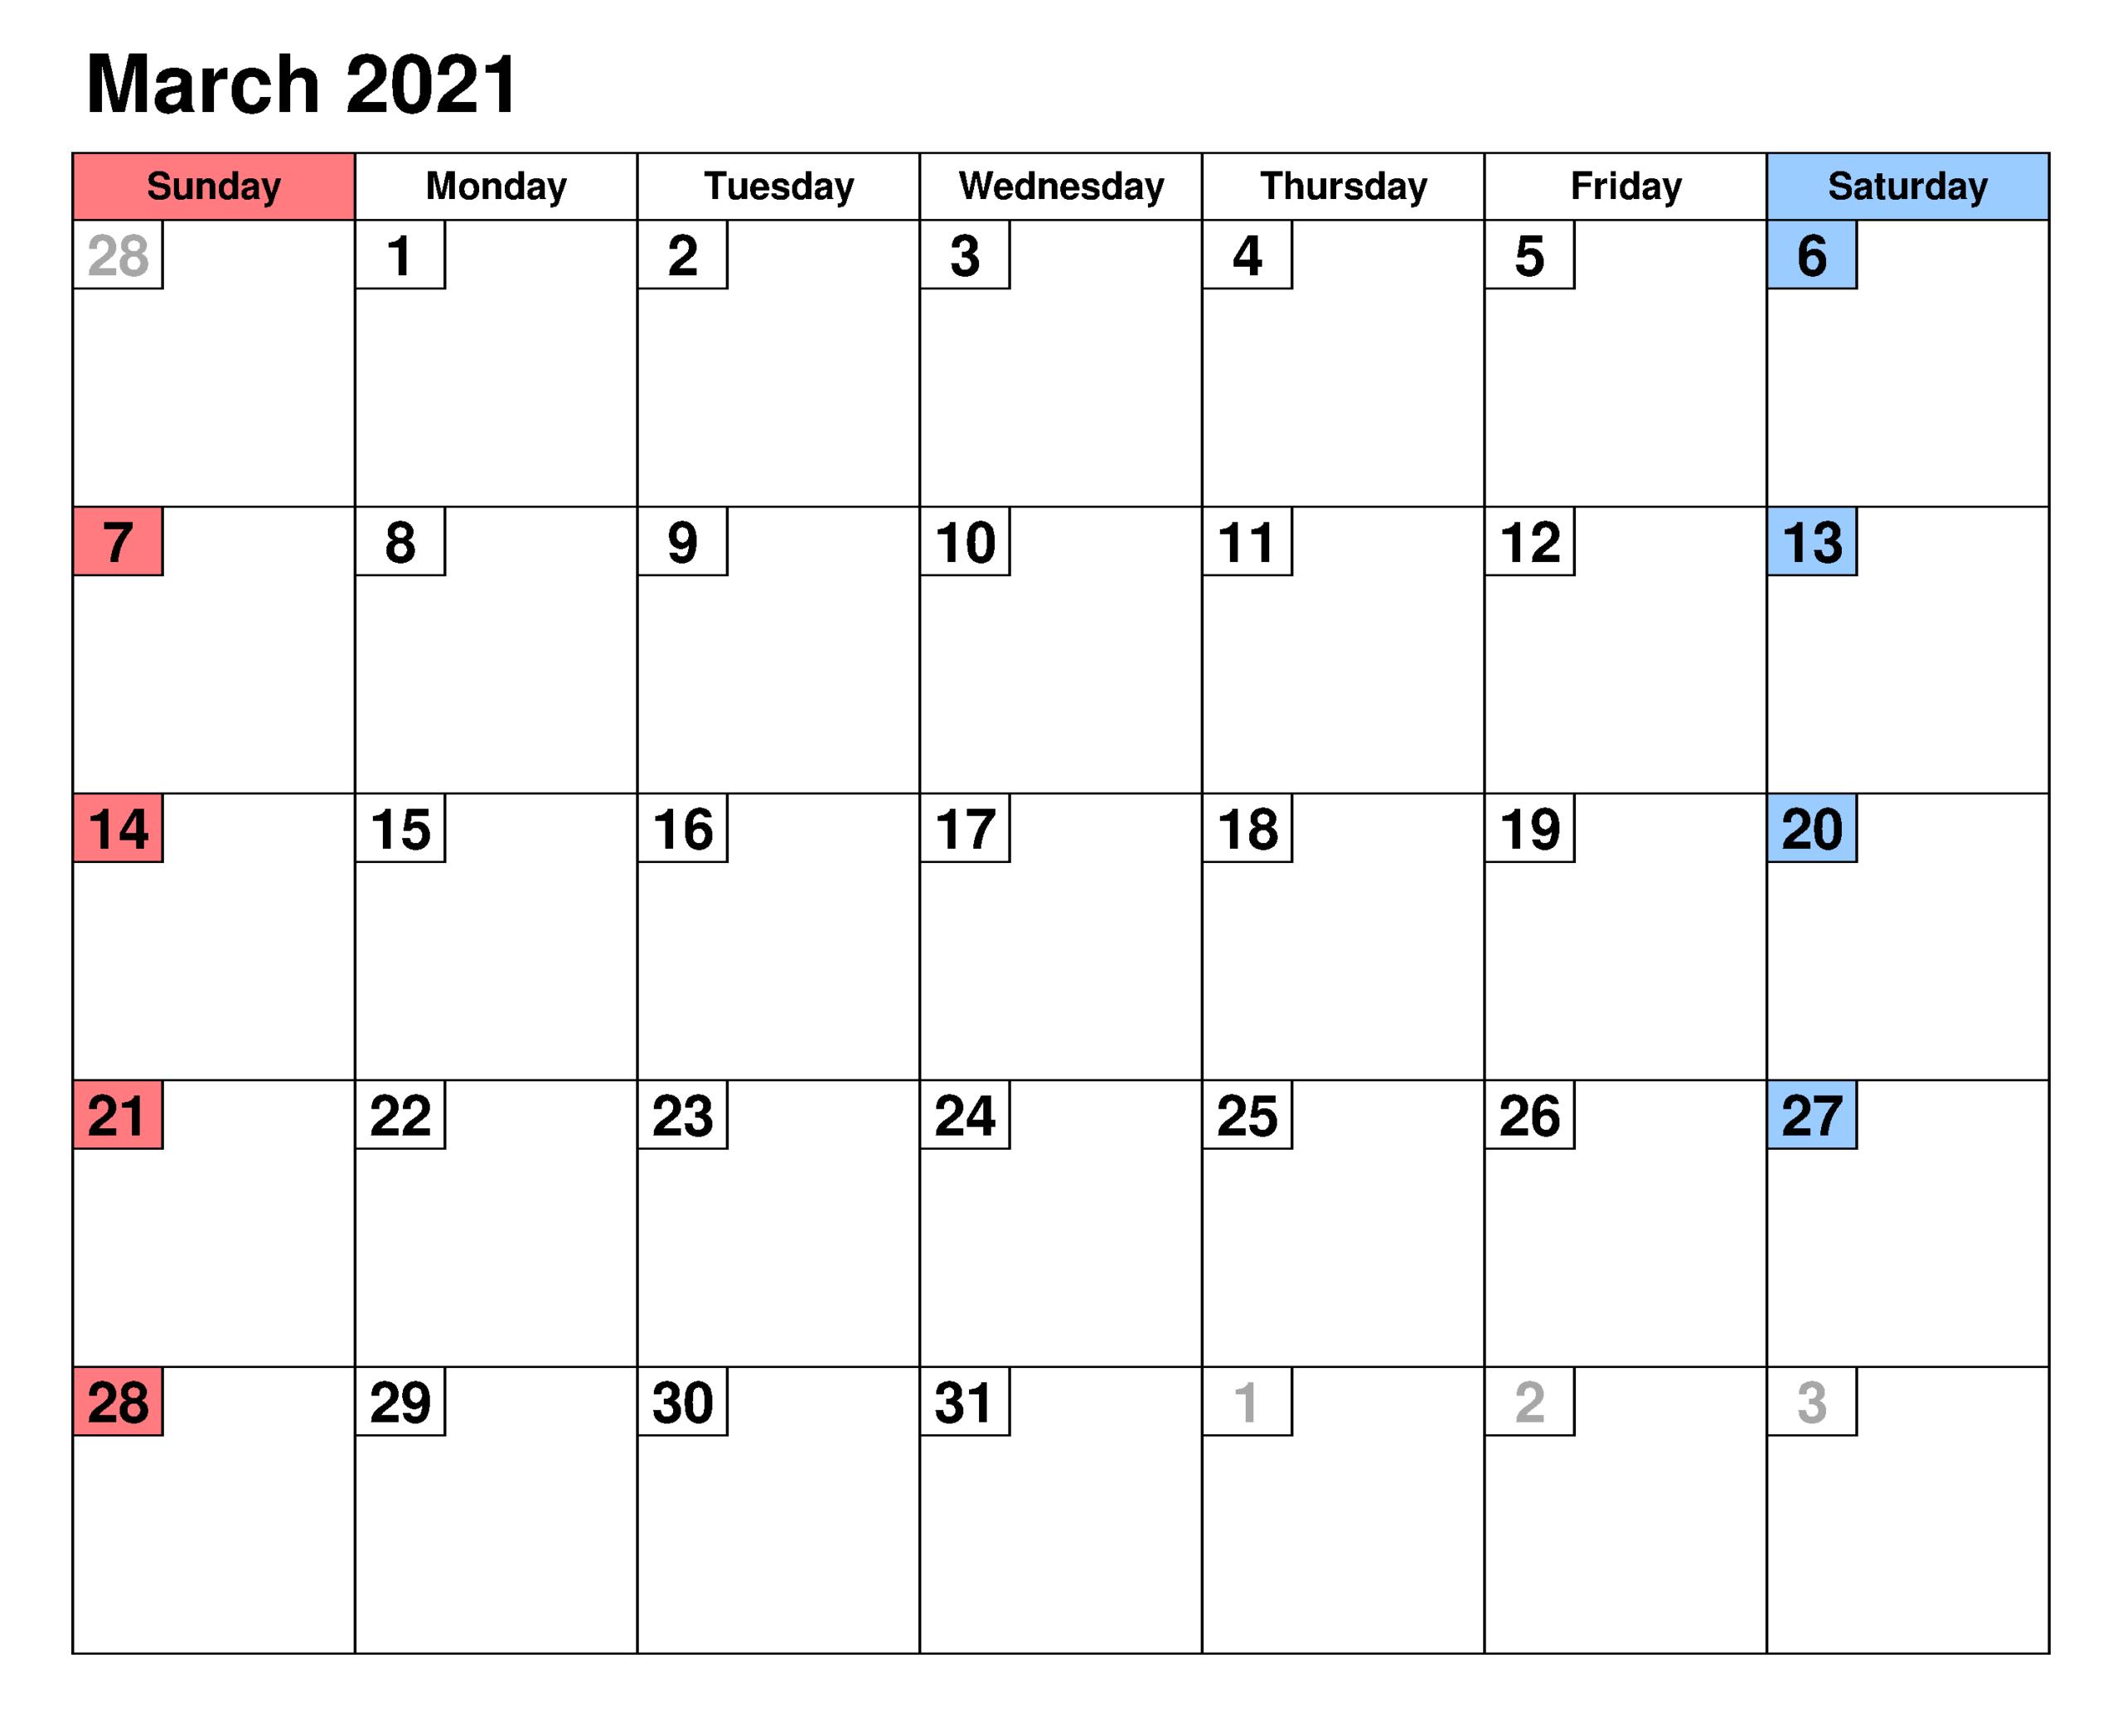 Printable March 2021 Calendar With Holidays - Zhudamodel